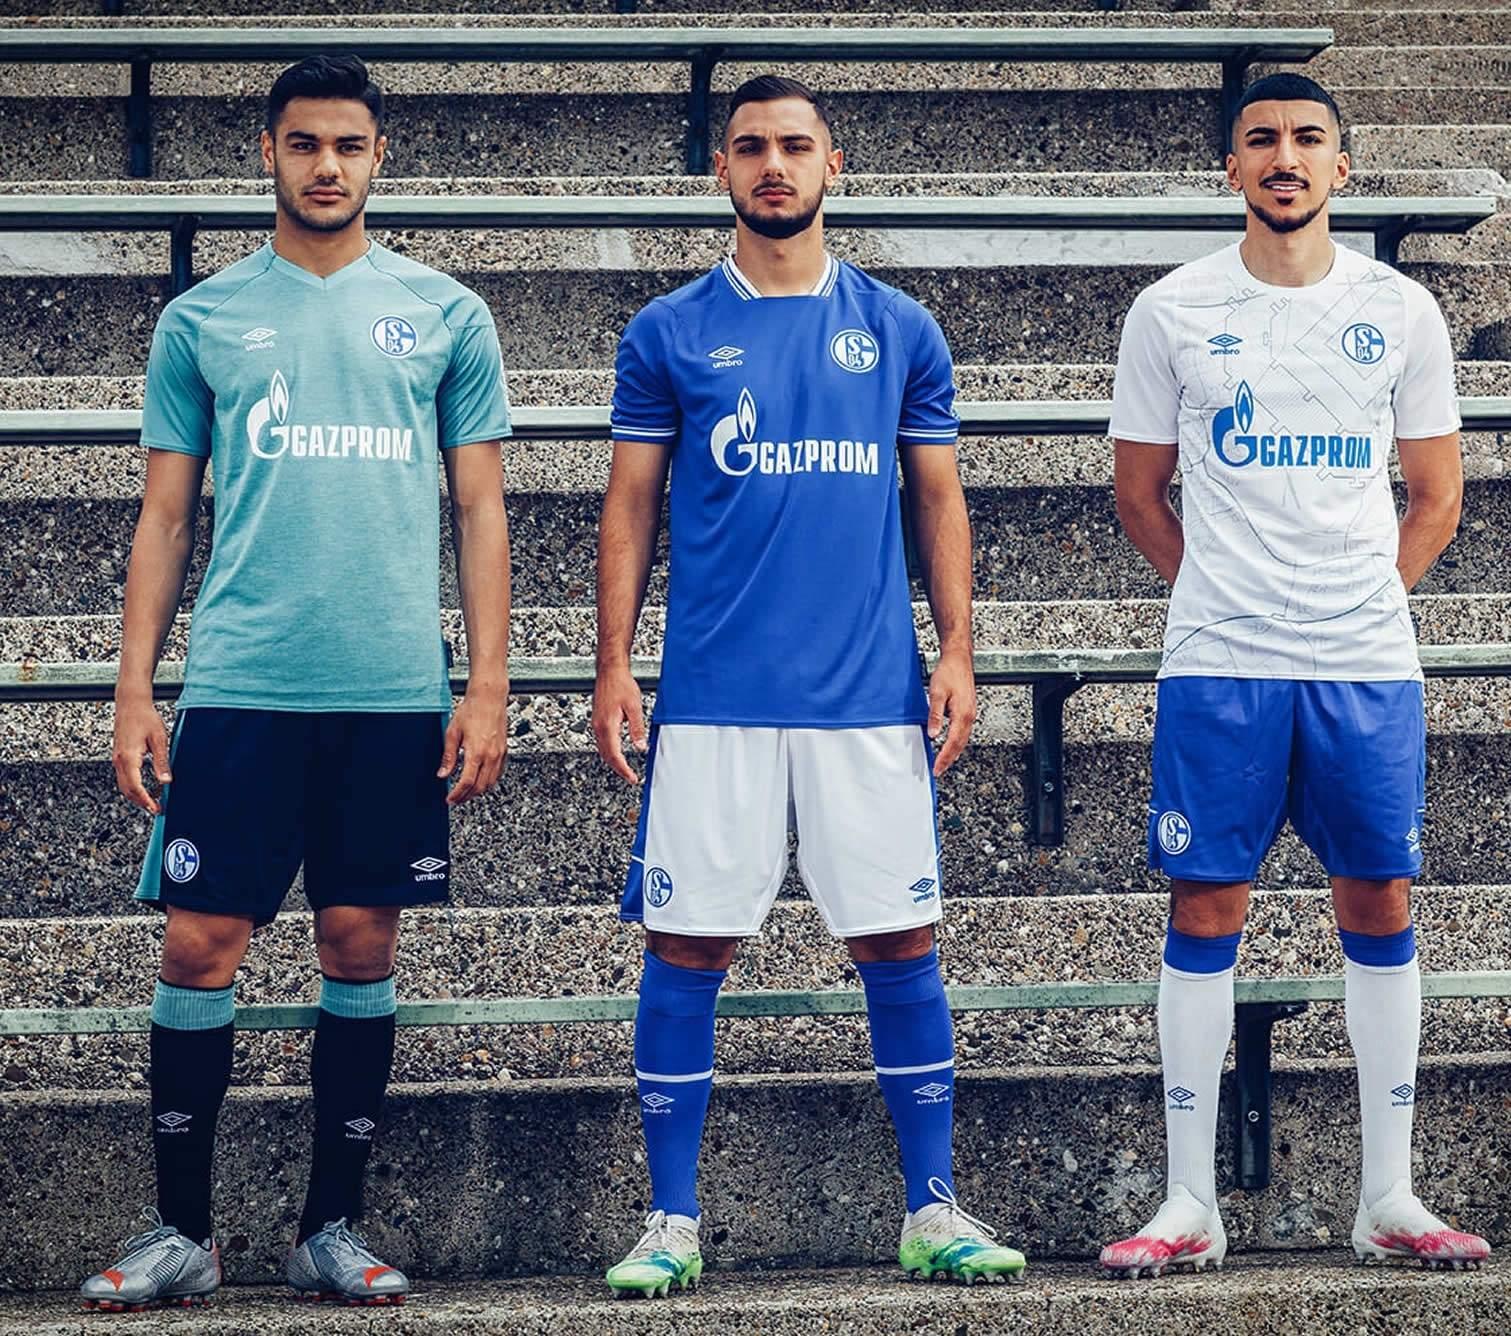 Camisetas Umbro del Schalke 04 2020/21 | Imagen Web Oficial